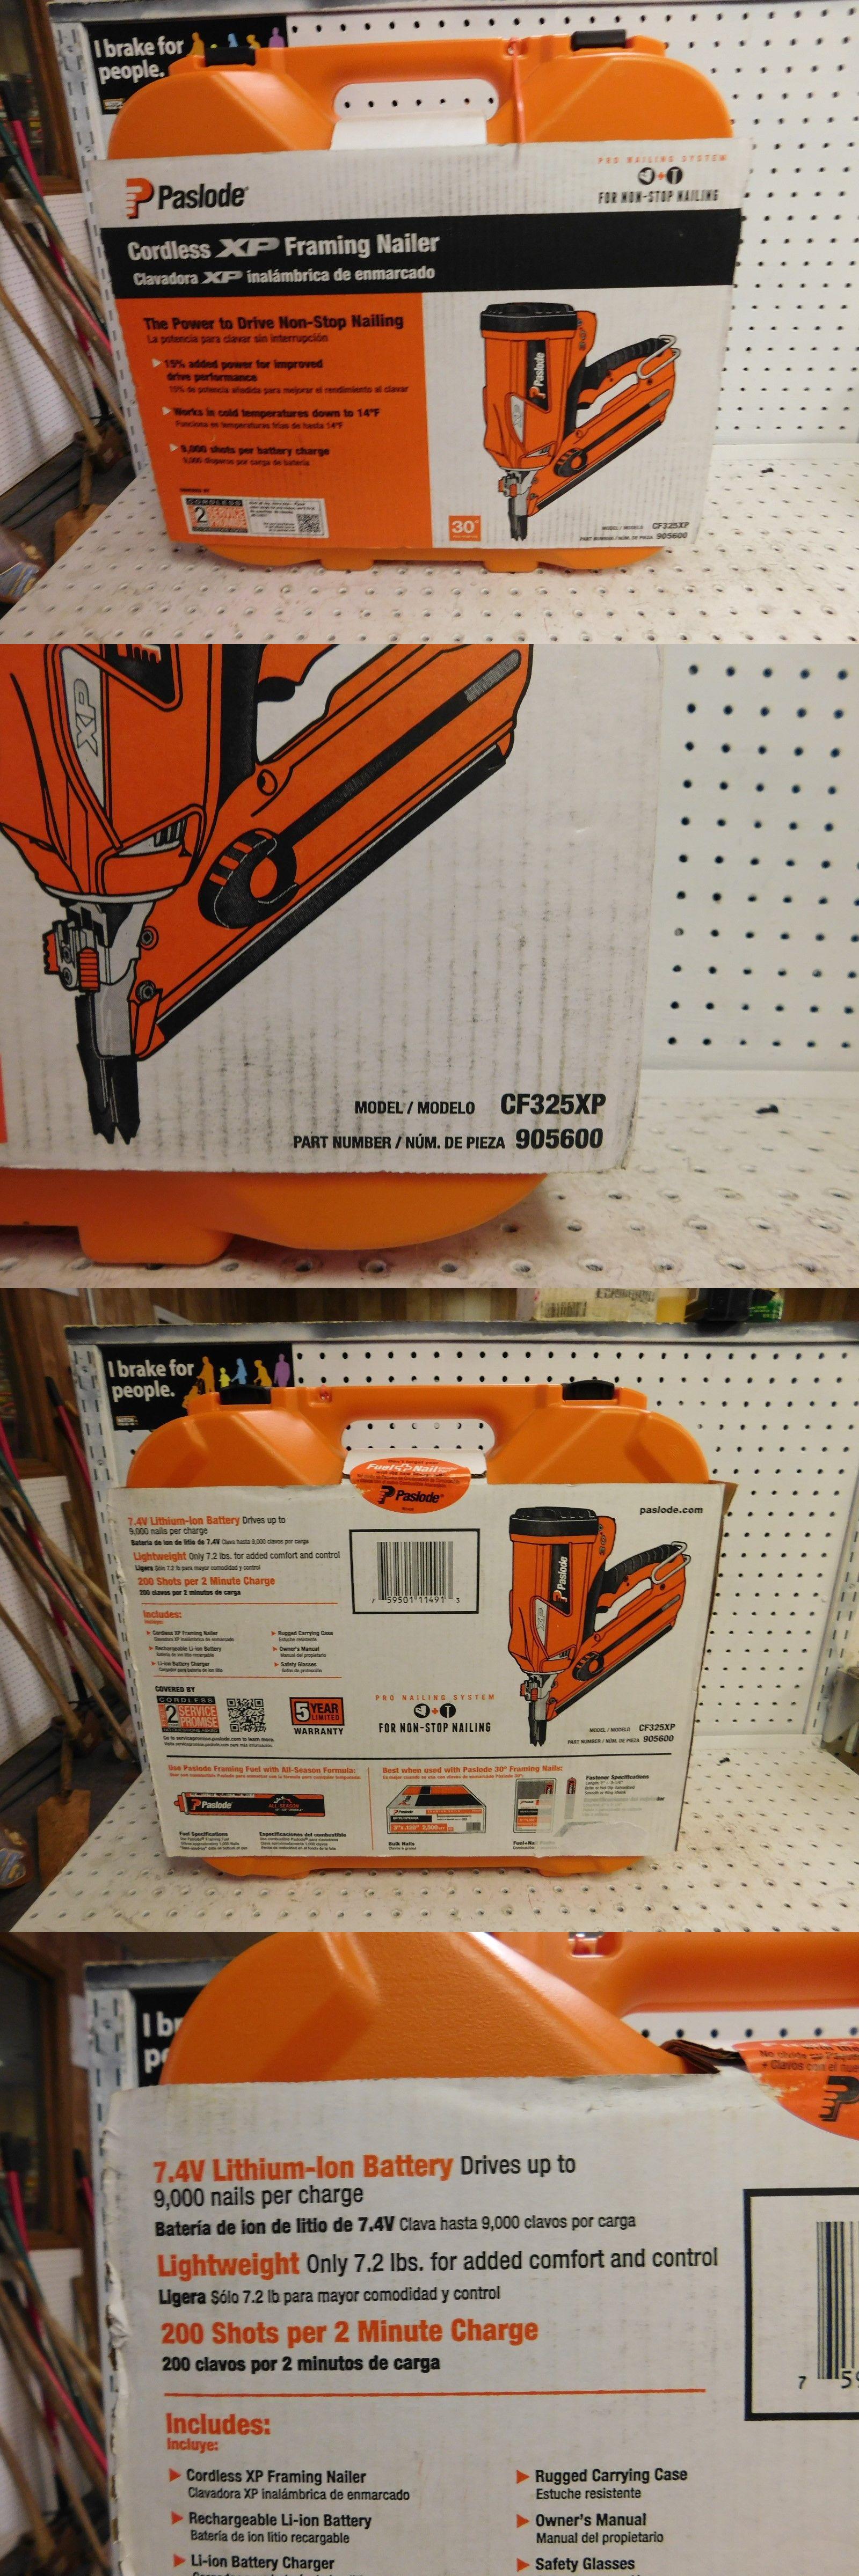 Nail and Staple Guns 122828: Paslode Li-Ion Cf325xp 30 Deg Cordless ...